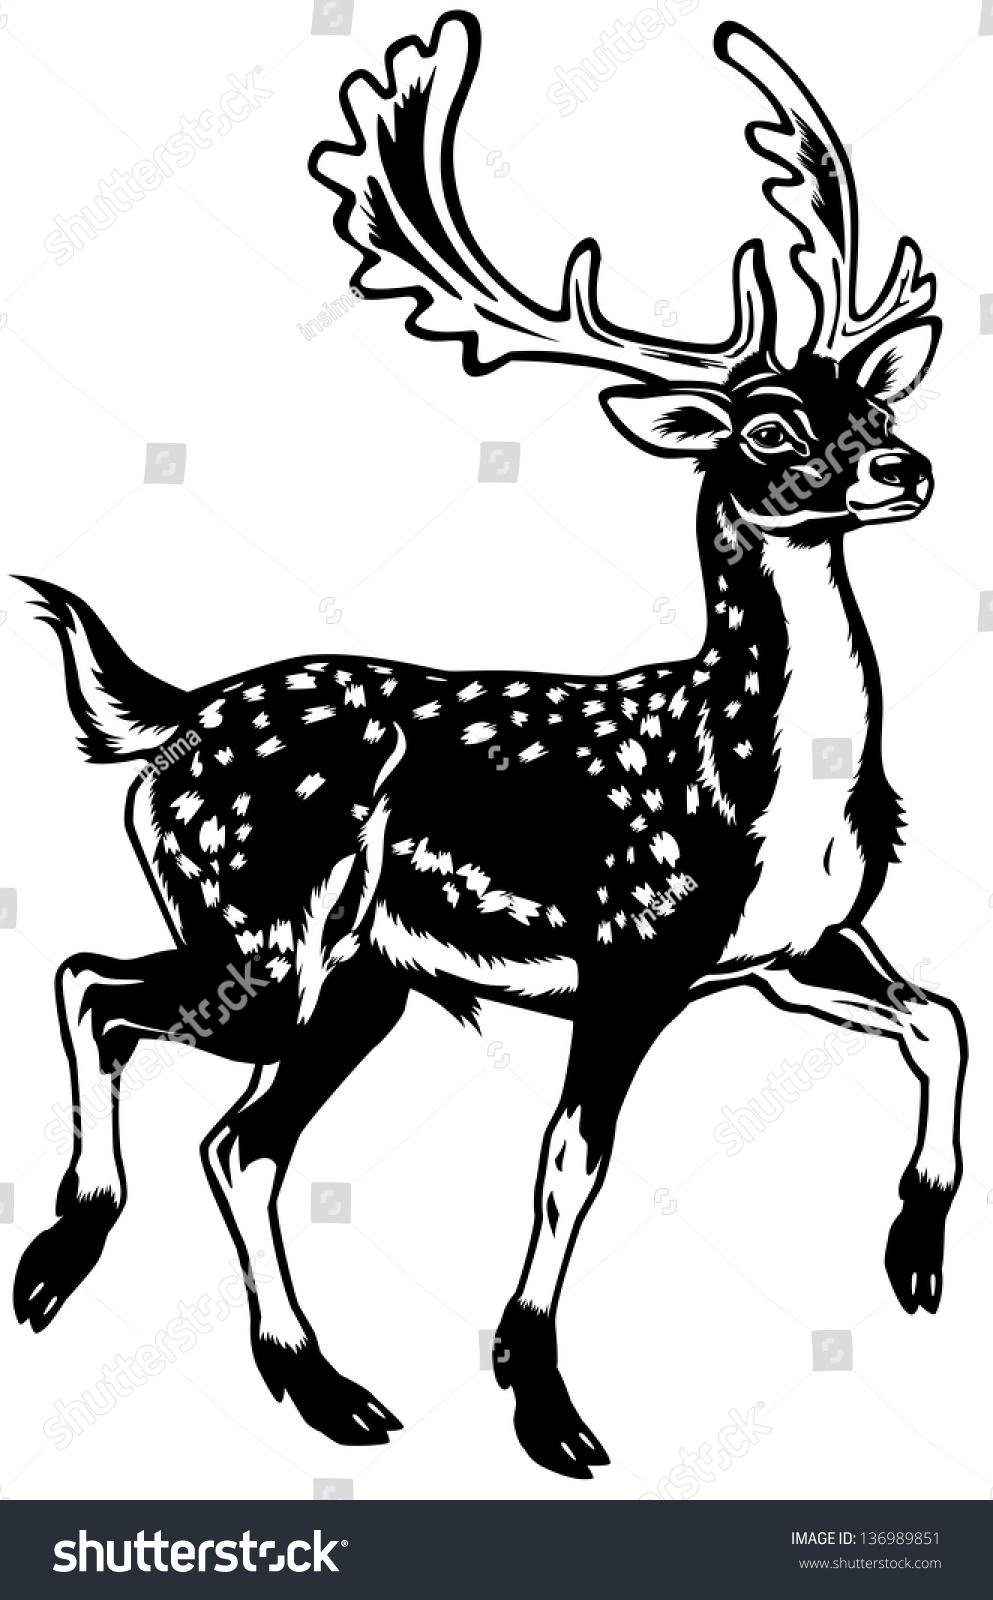 Deer illustration black and white - photo#18